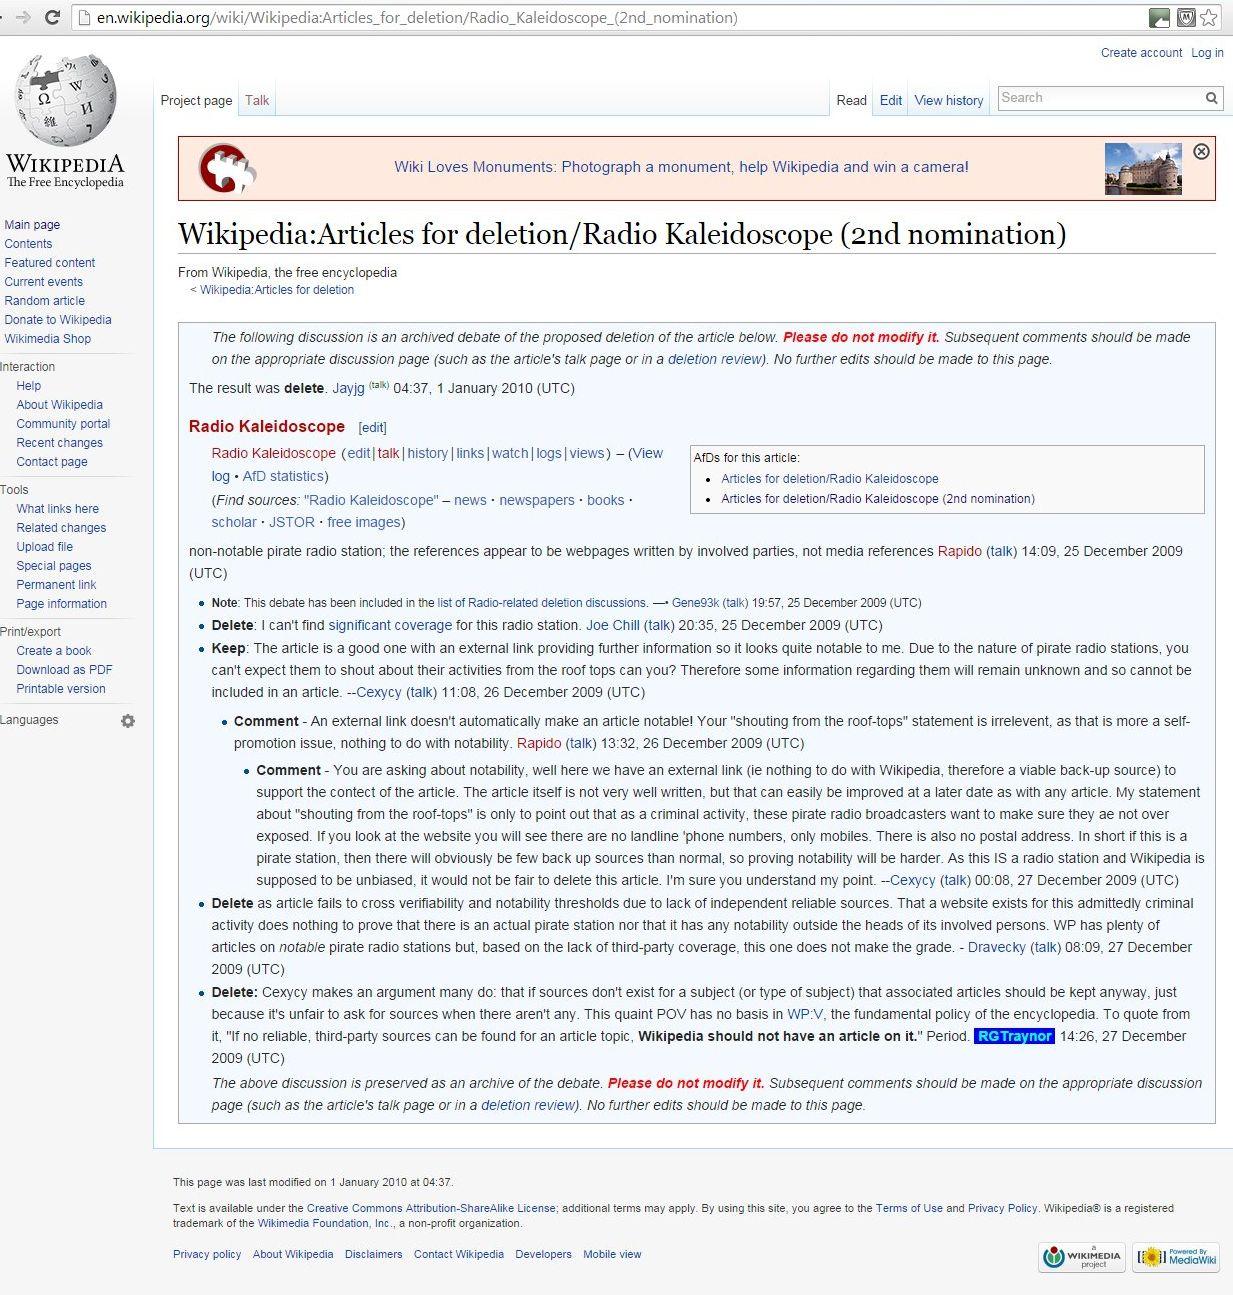 Radio Kaleidoscope wiki deletion article